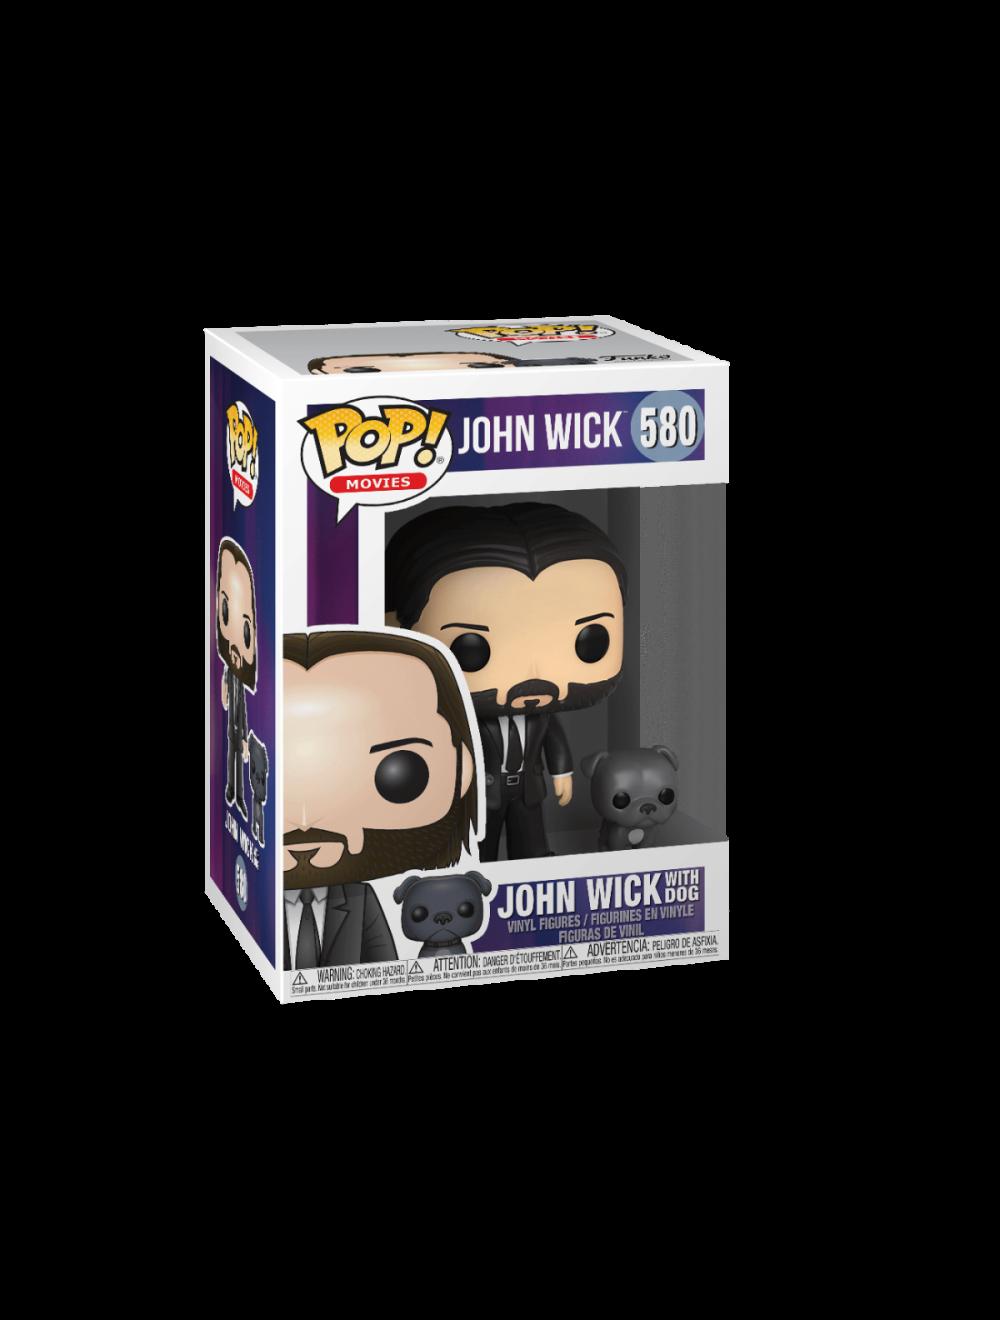 Funko POP! John Wick - John in Black Suit és Dog Vinyl Figurák 10cm